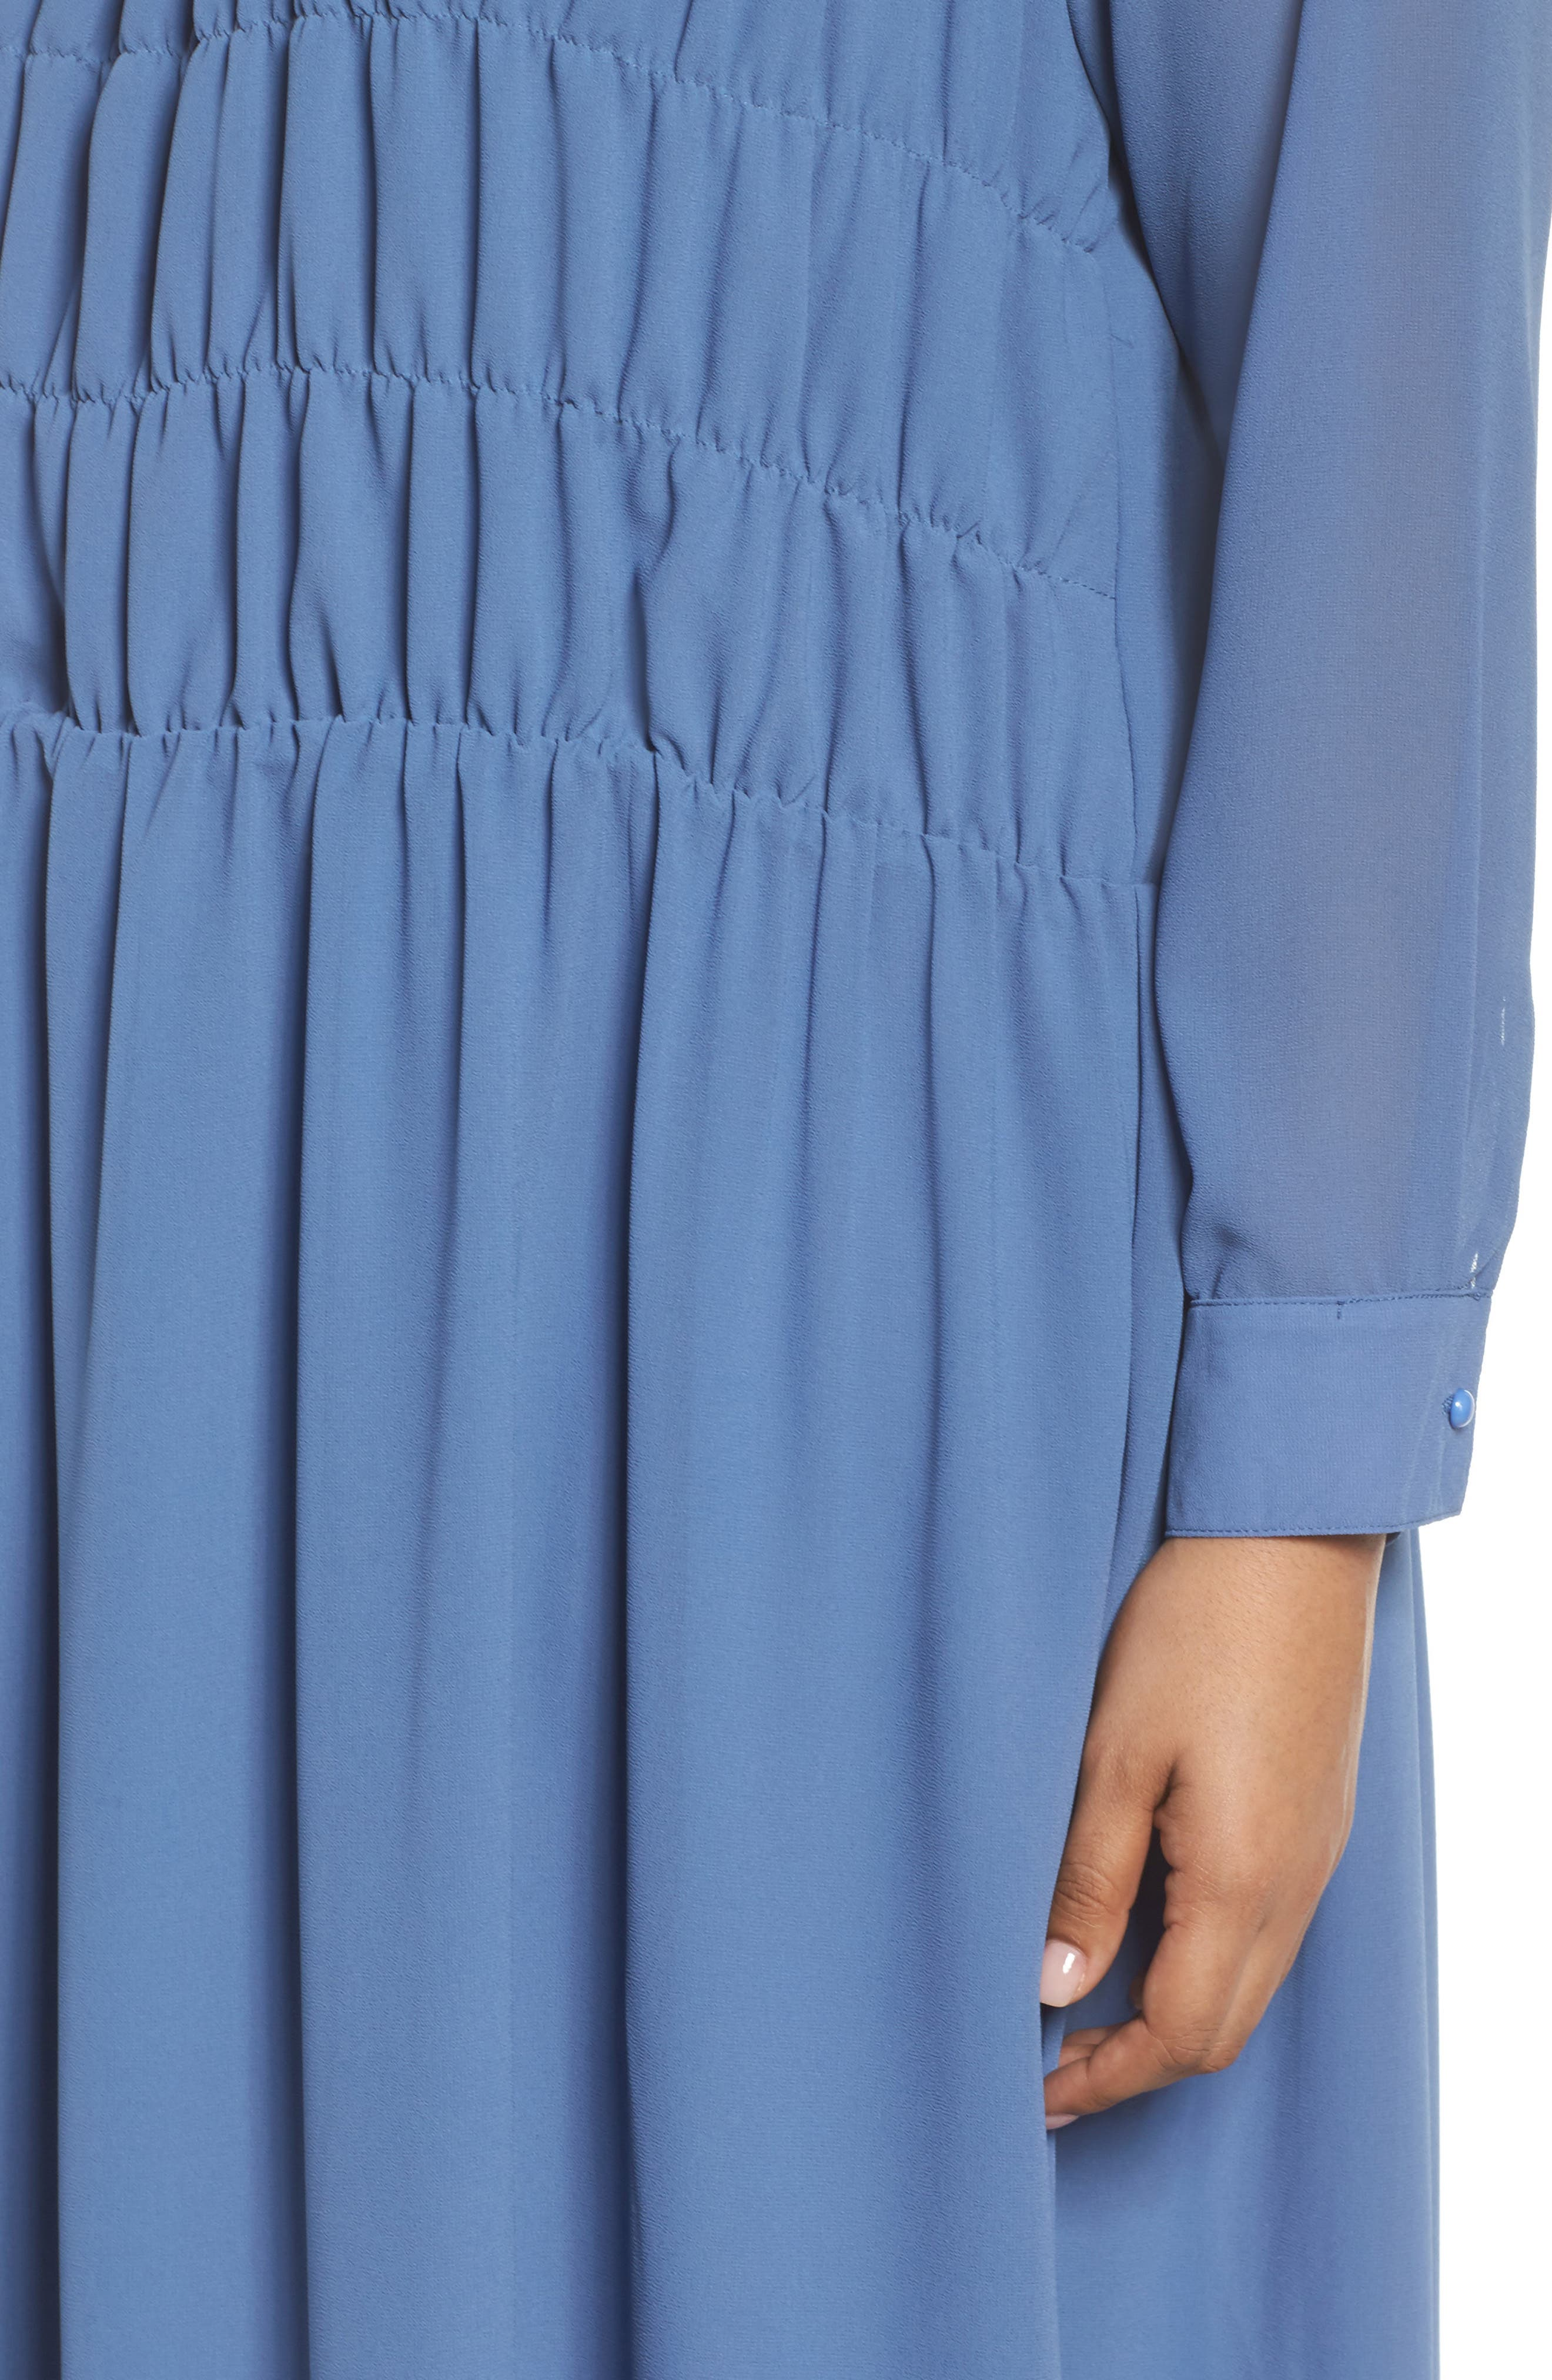 Smocked Chiffon Dress,                             Alternate thumbnail 4, color,                             400